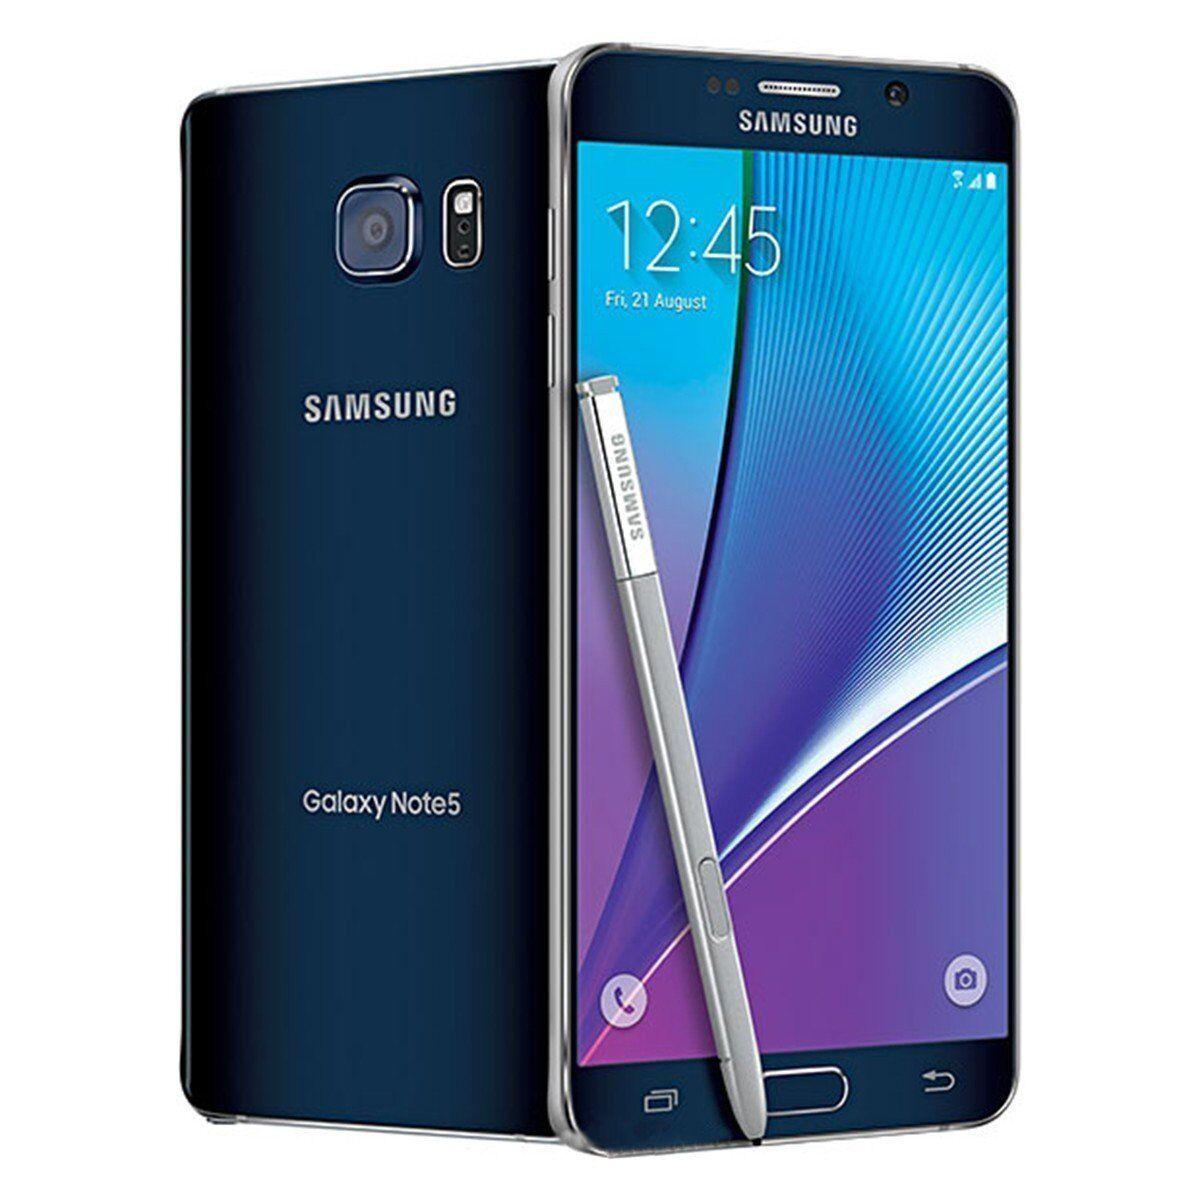 Samsung Galaxy Note 5 Unlocked SM-N920V Verizon, AT&T T-Mobile 64GB - Black N920 1